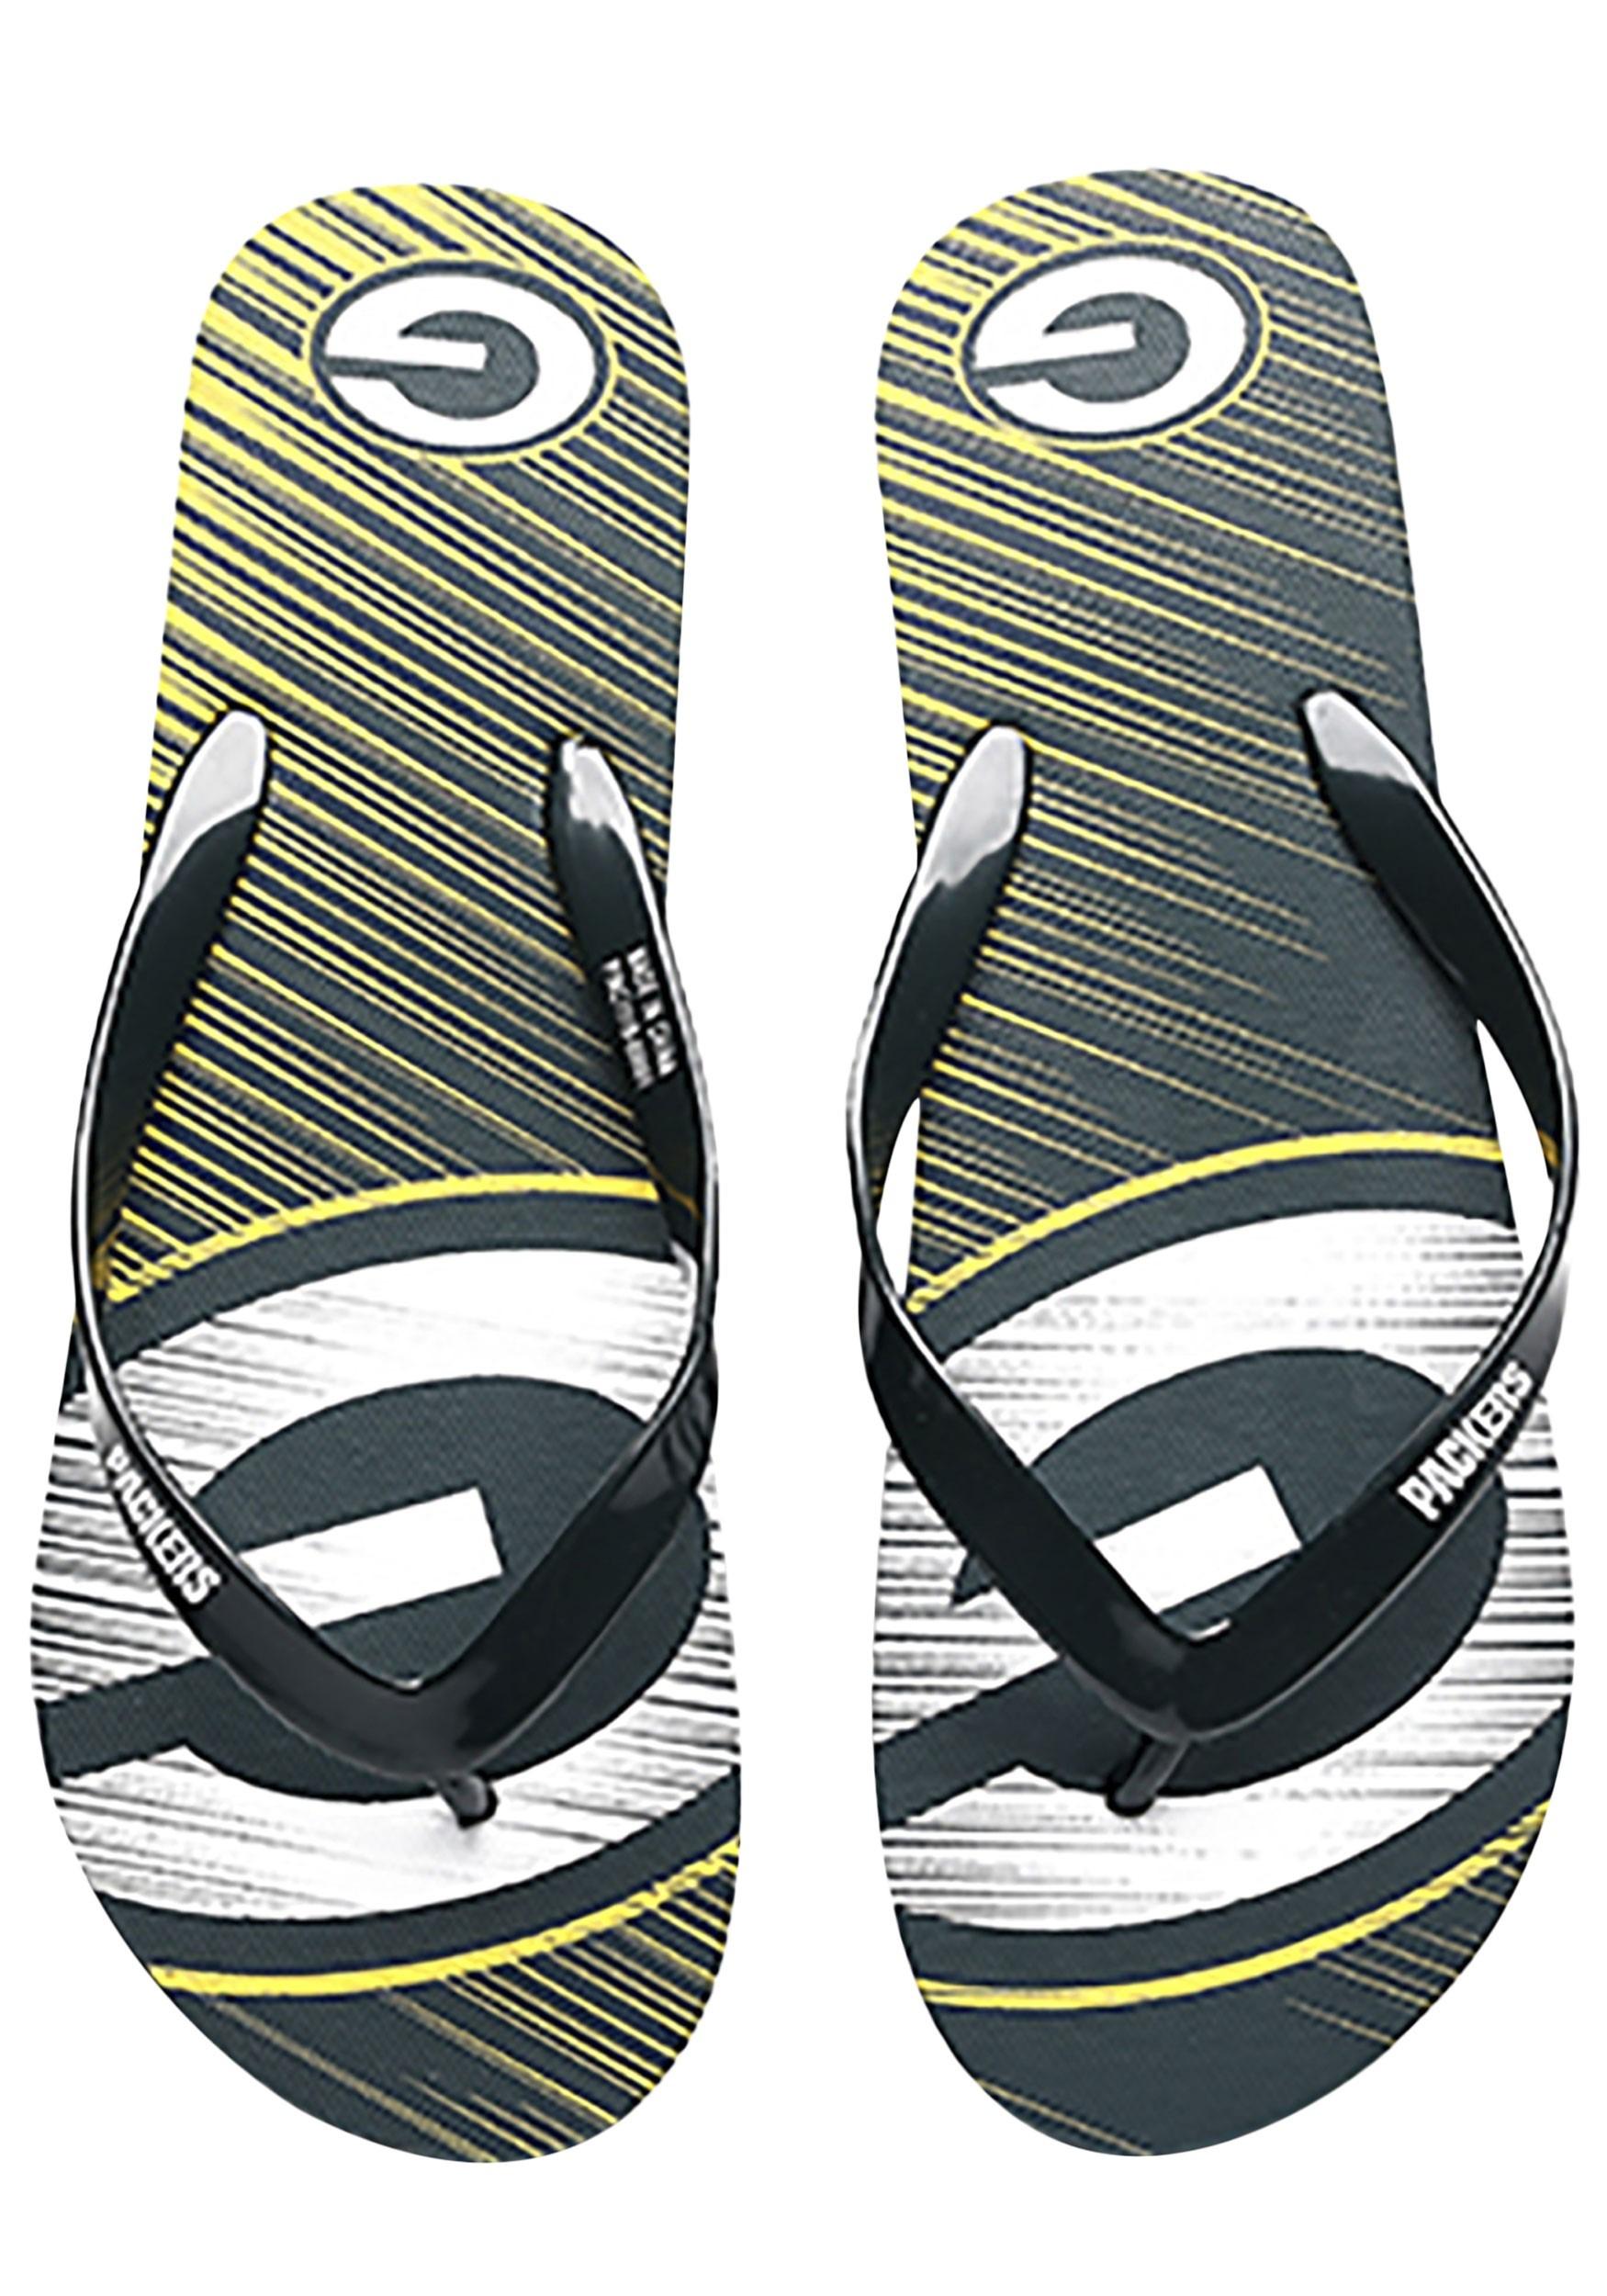 0f478d0d9ab4f Green Bay Packers Diagonal Stripe Unisex Flip Flop